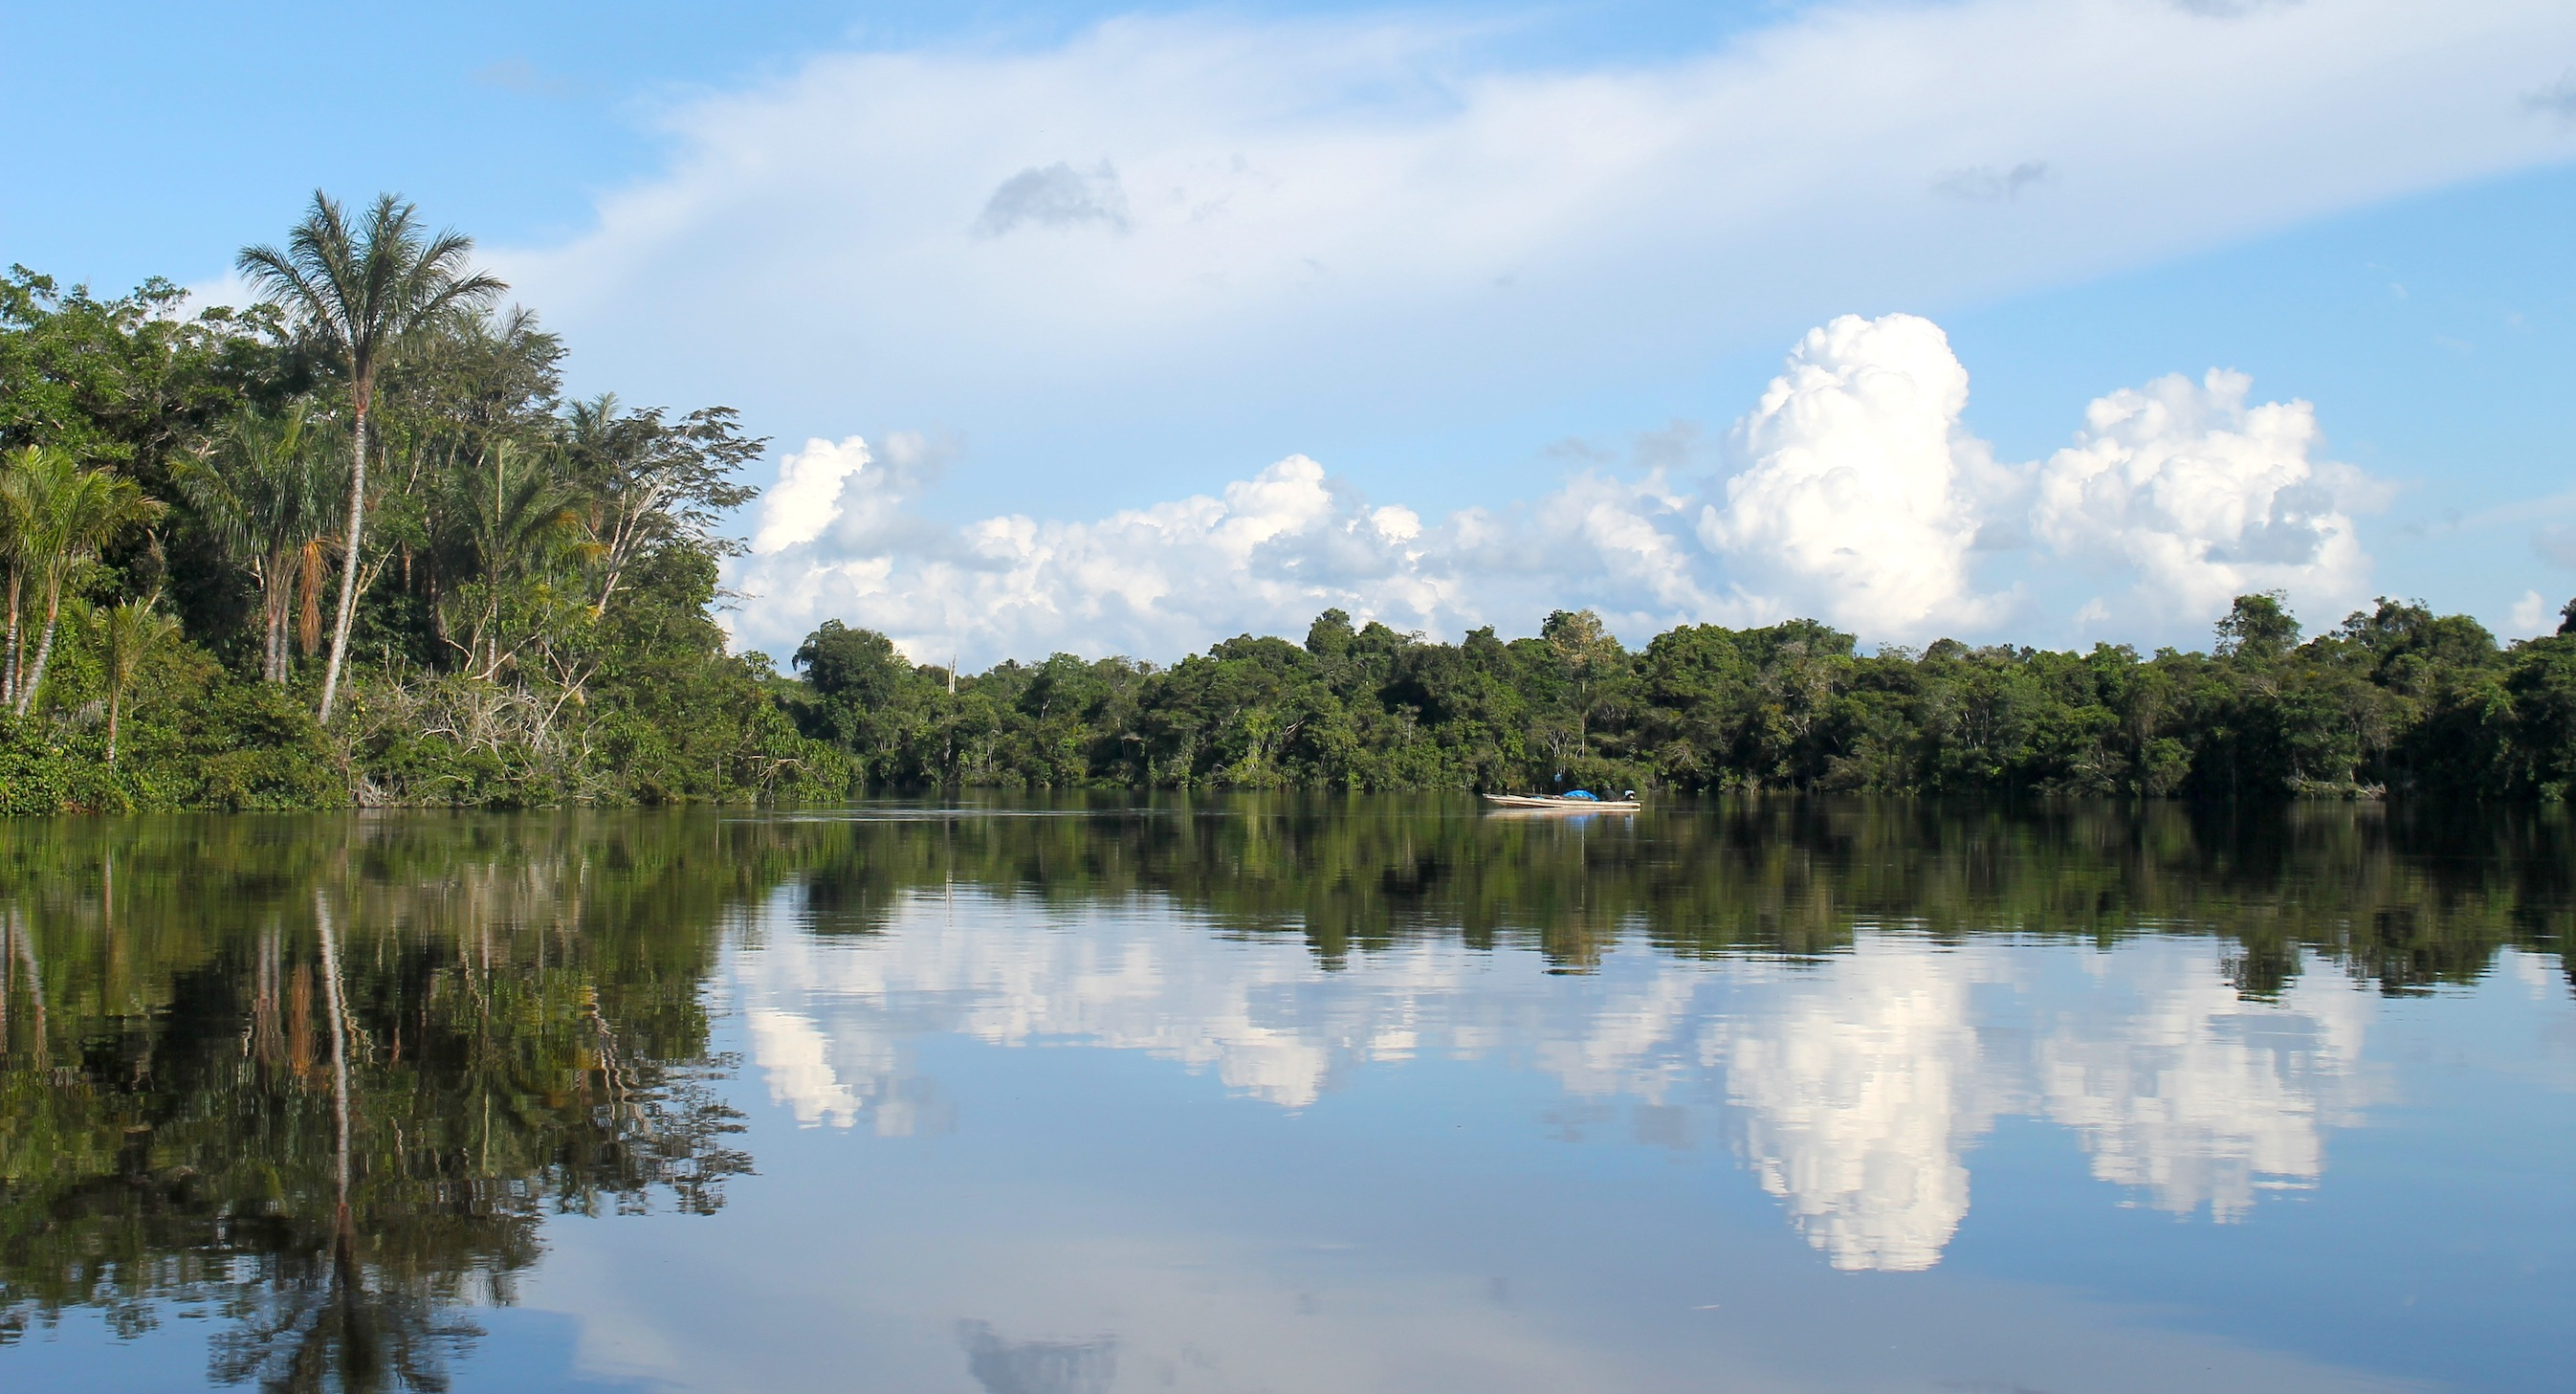 Viaja a la inexplorada Reserva Nacional Allpahuayo Mishana, en Iquitos (Parte I)